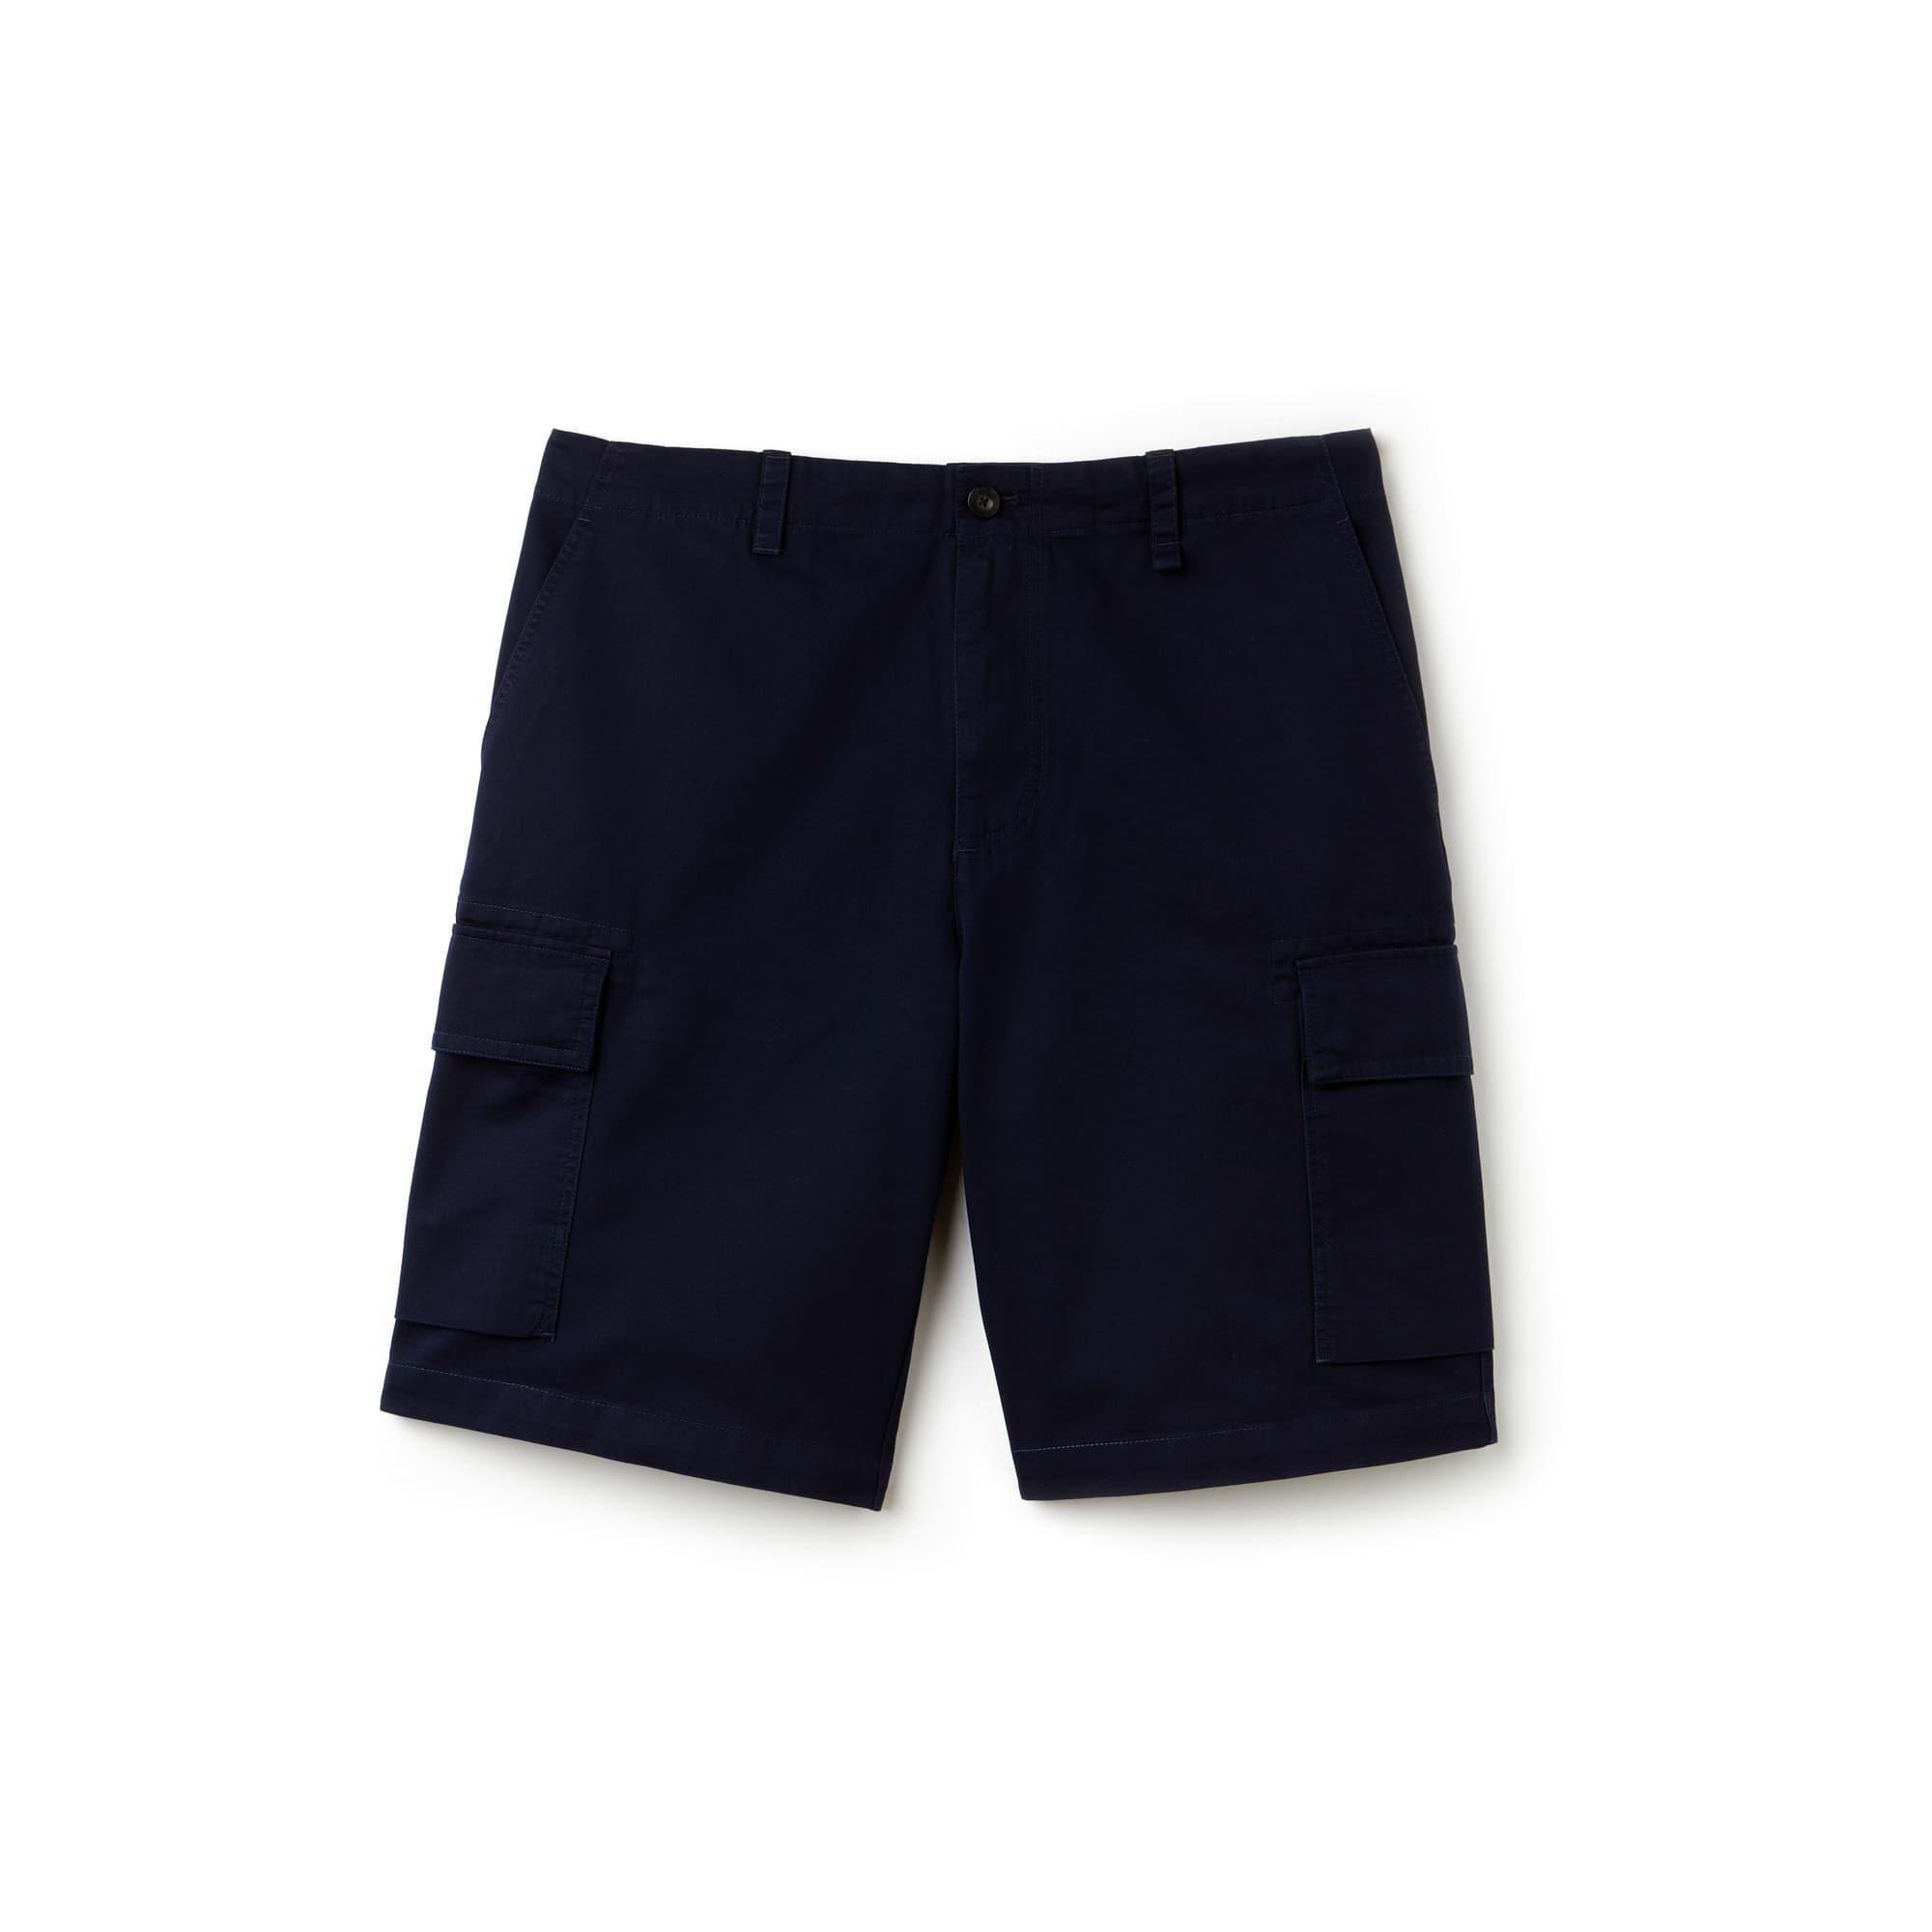 Bermuda cargo en twill de coton uni avec poches